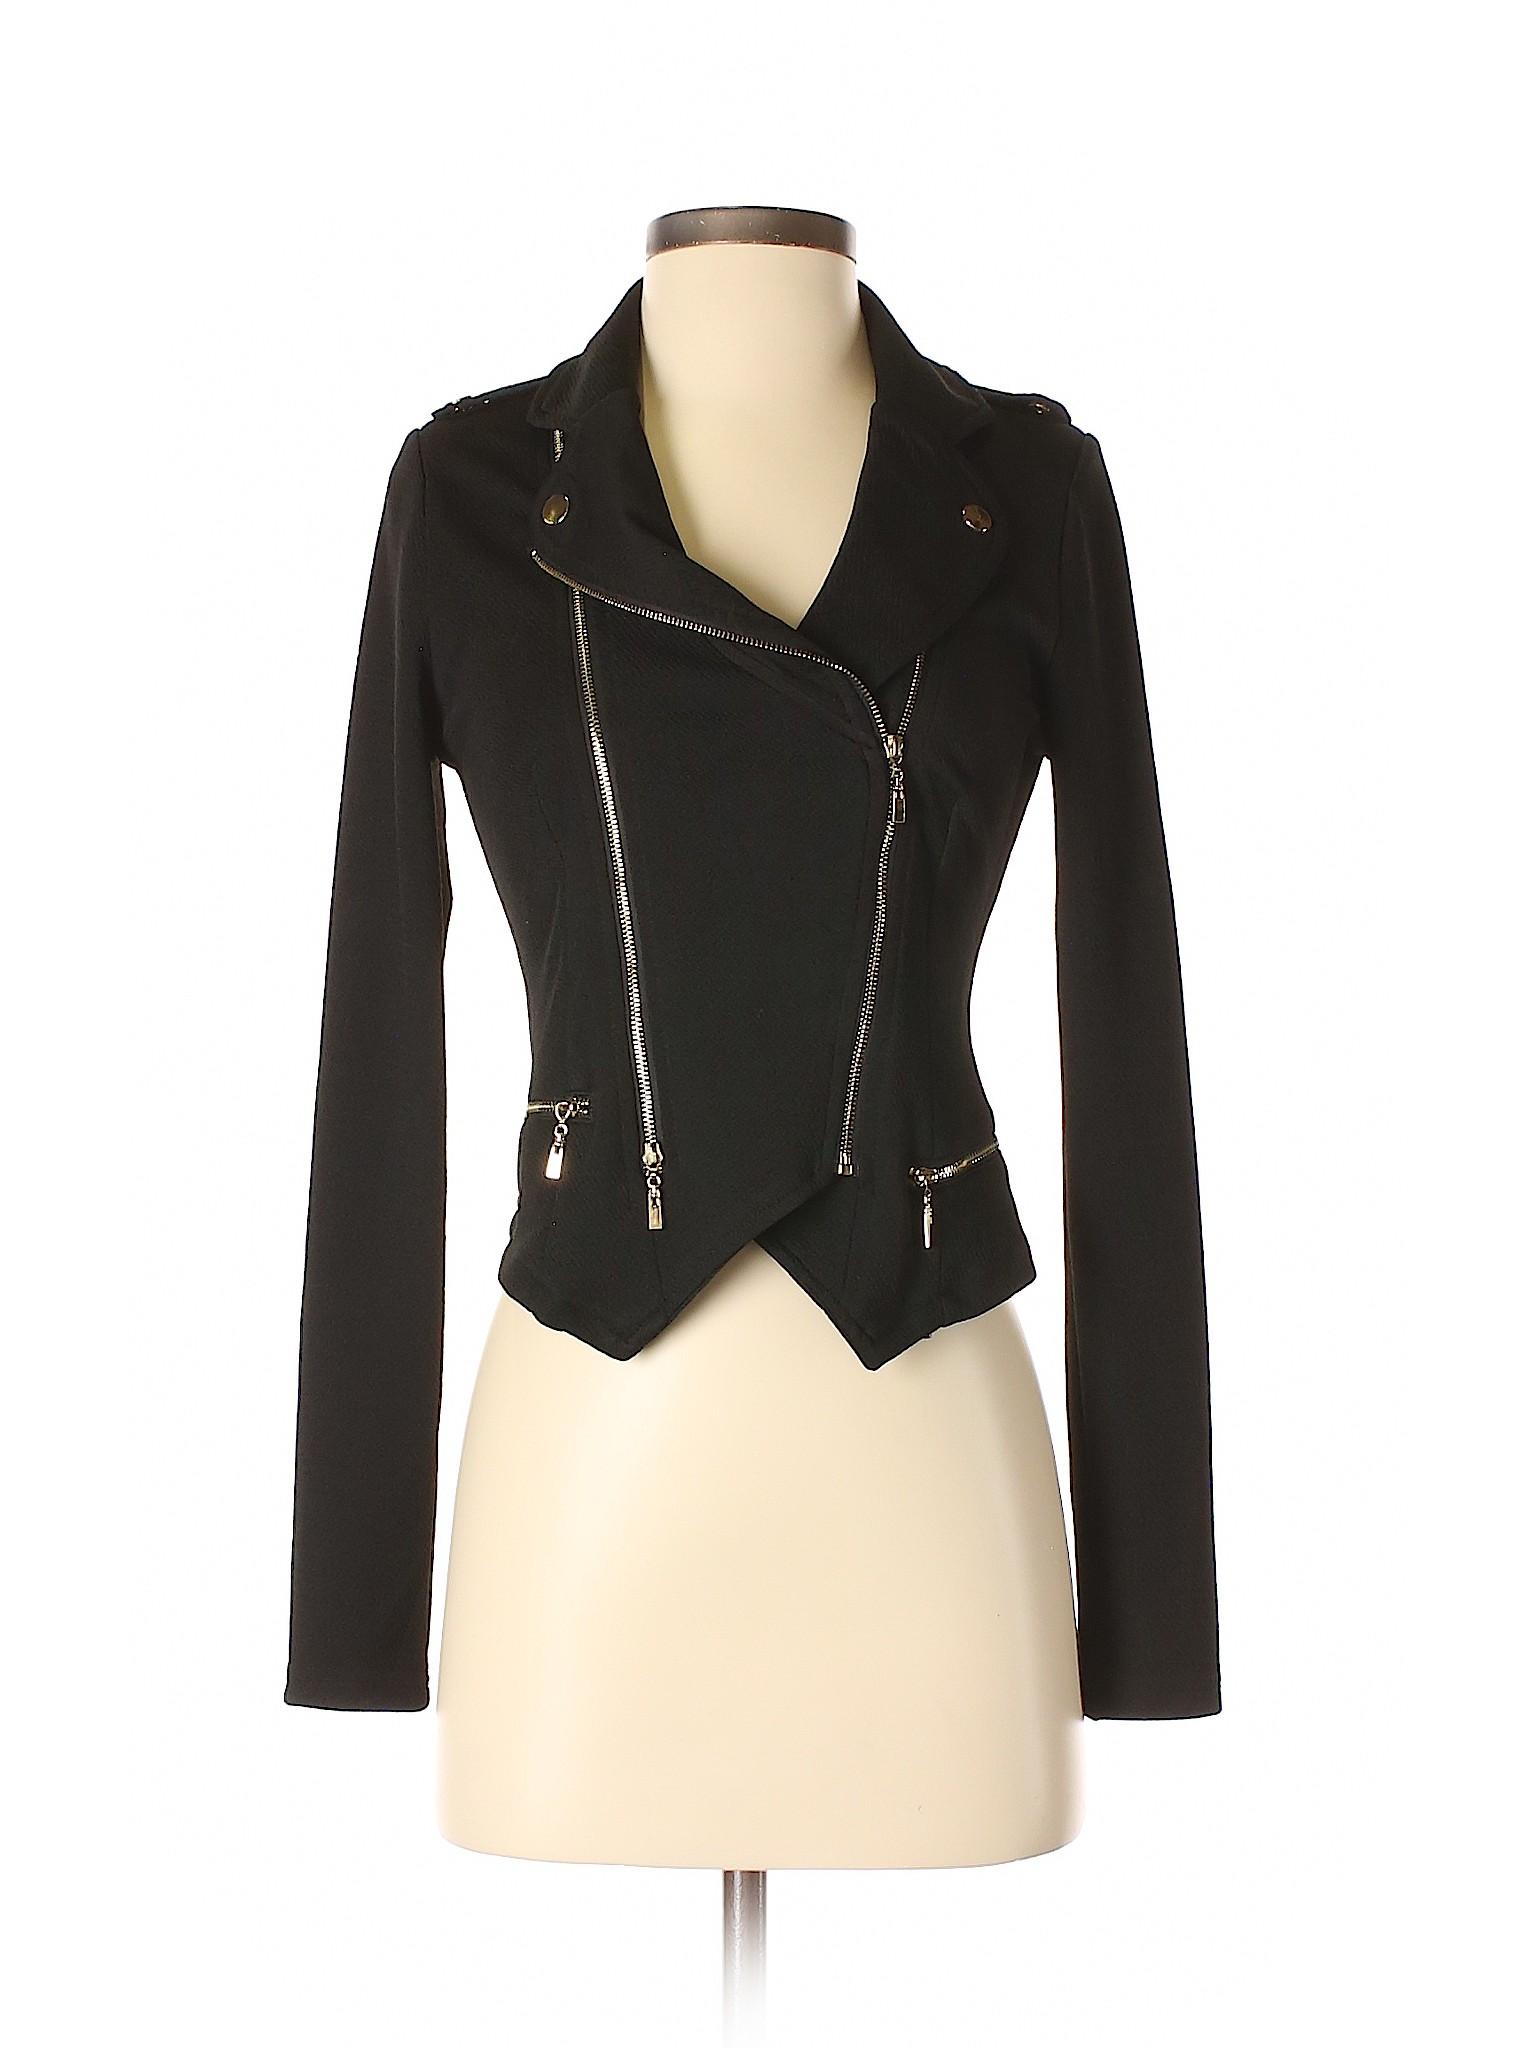 iris Boutique winter Jacket Boutique winter 8BOq7O4t